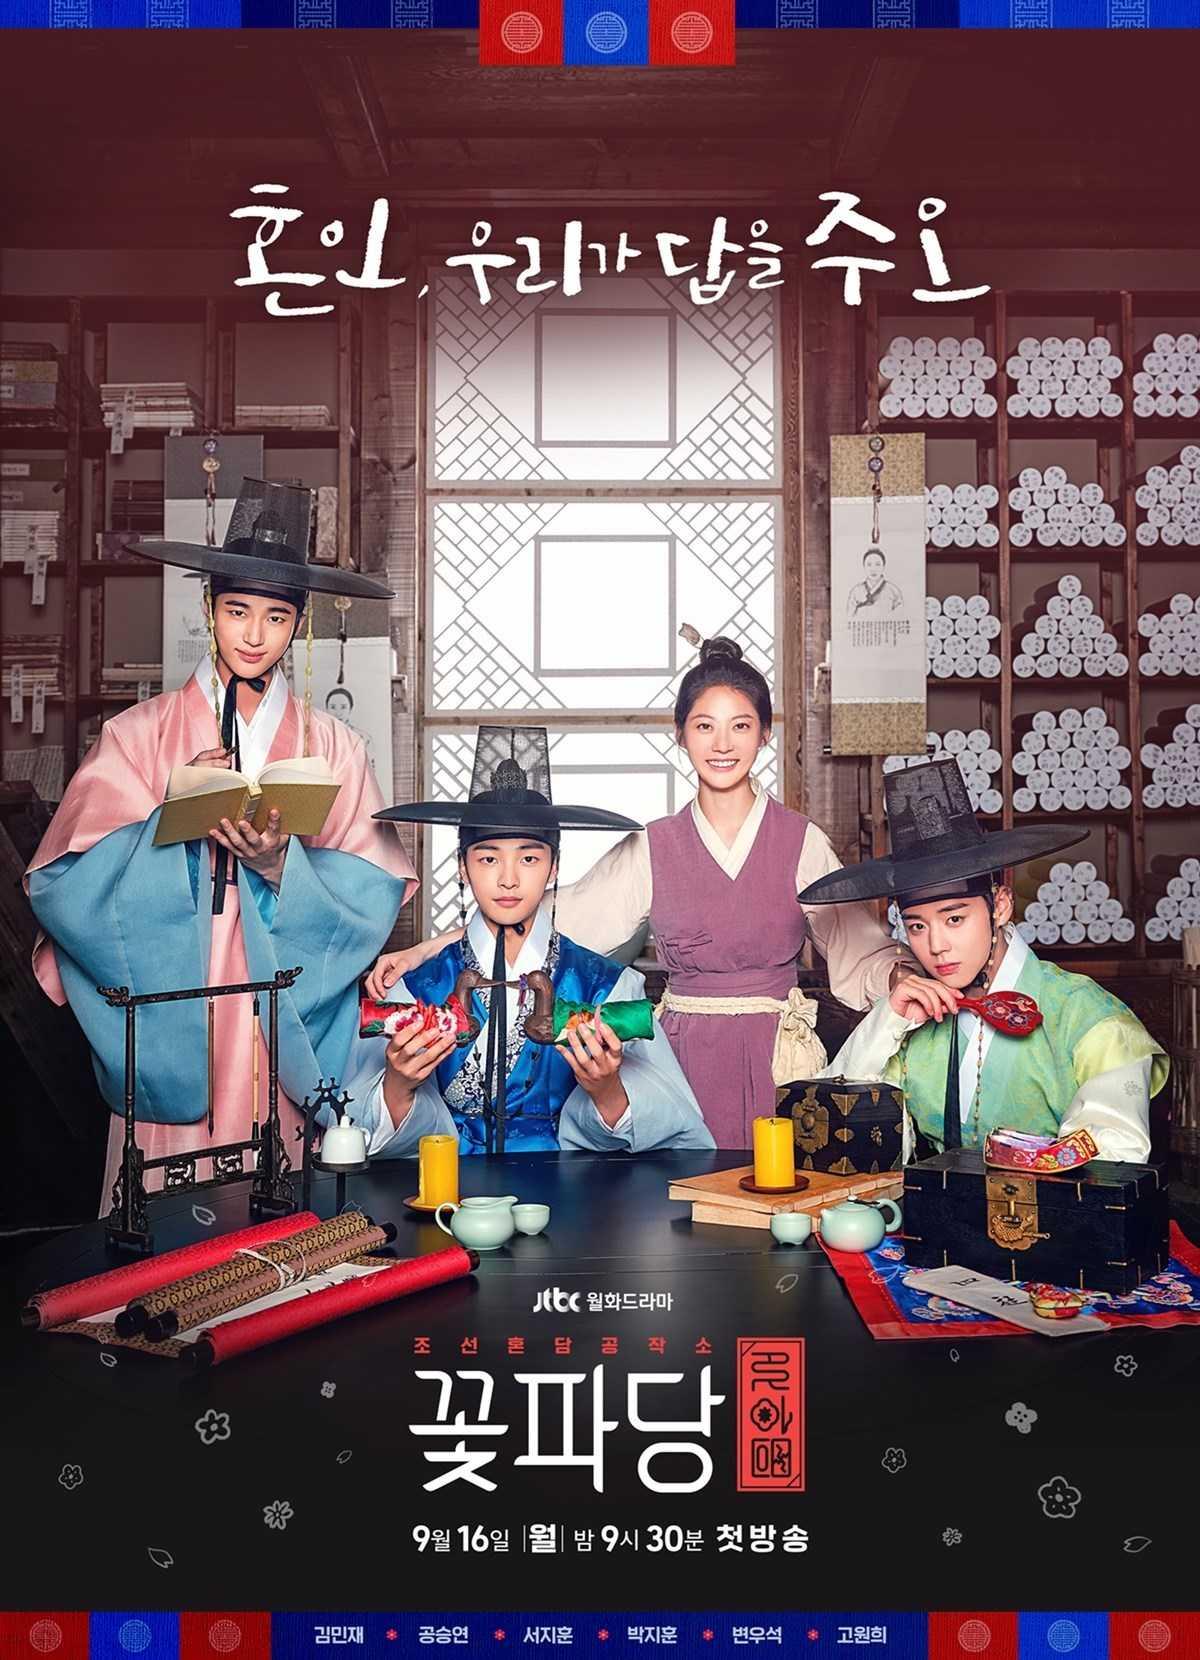 flower-crew-joseon-marriage-agency-ตอนที่-1-10-ซับไทย-ยังไม่จบ-